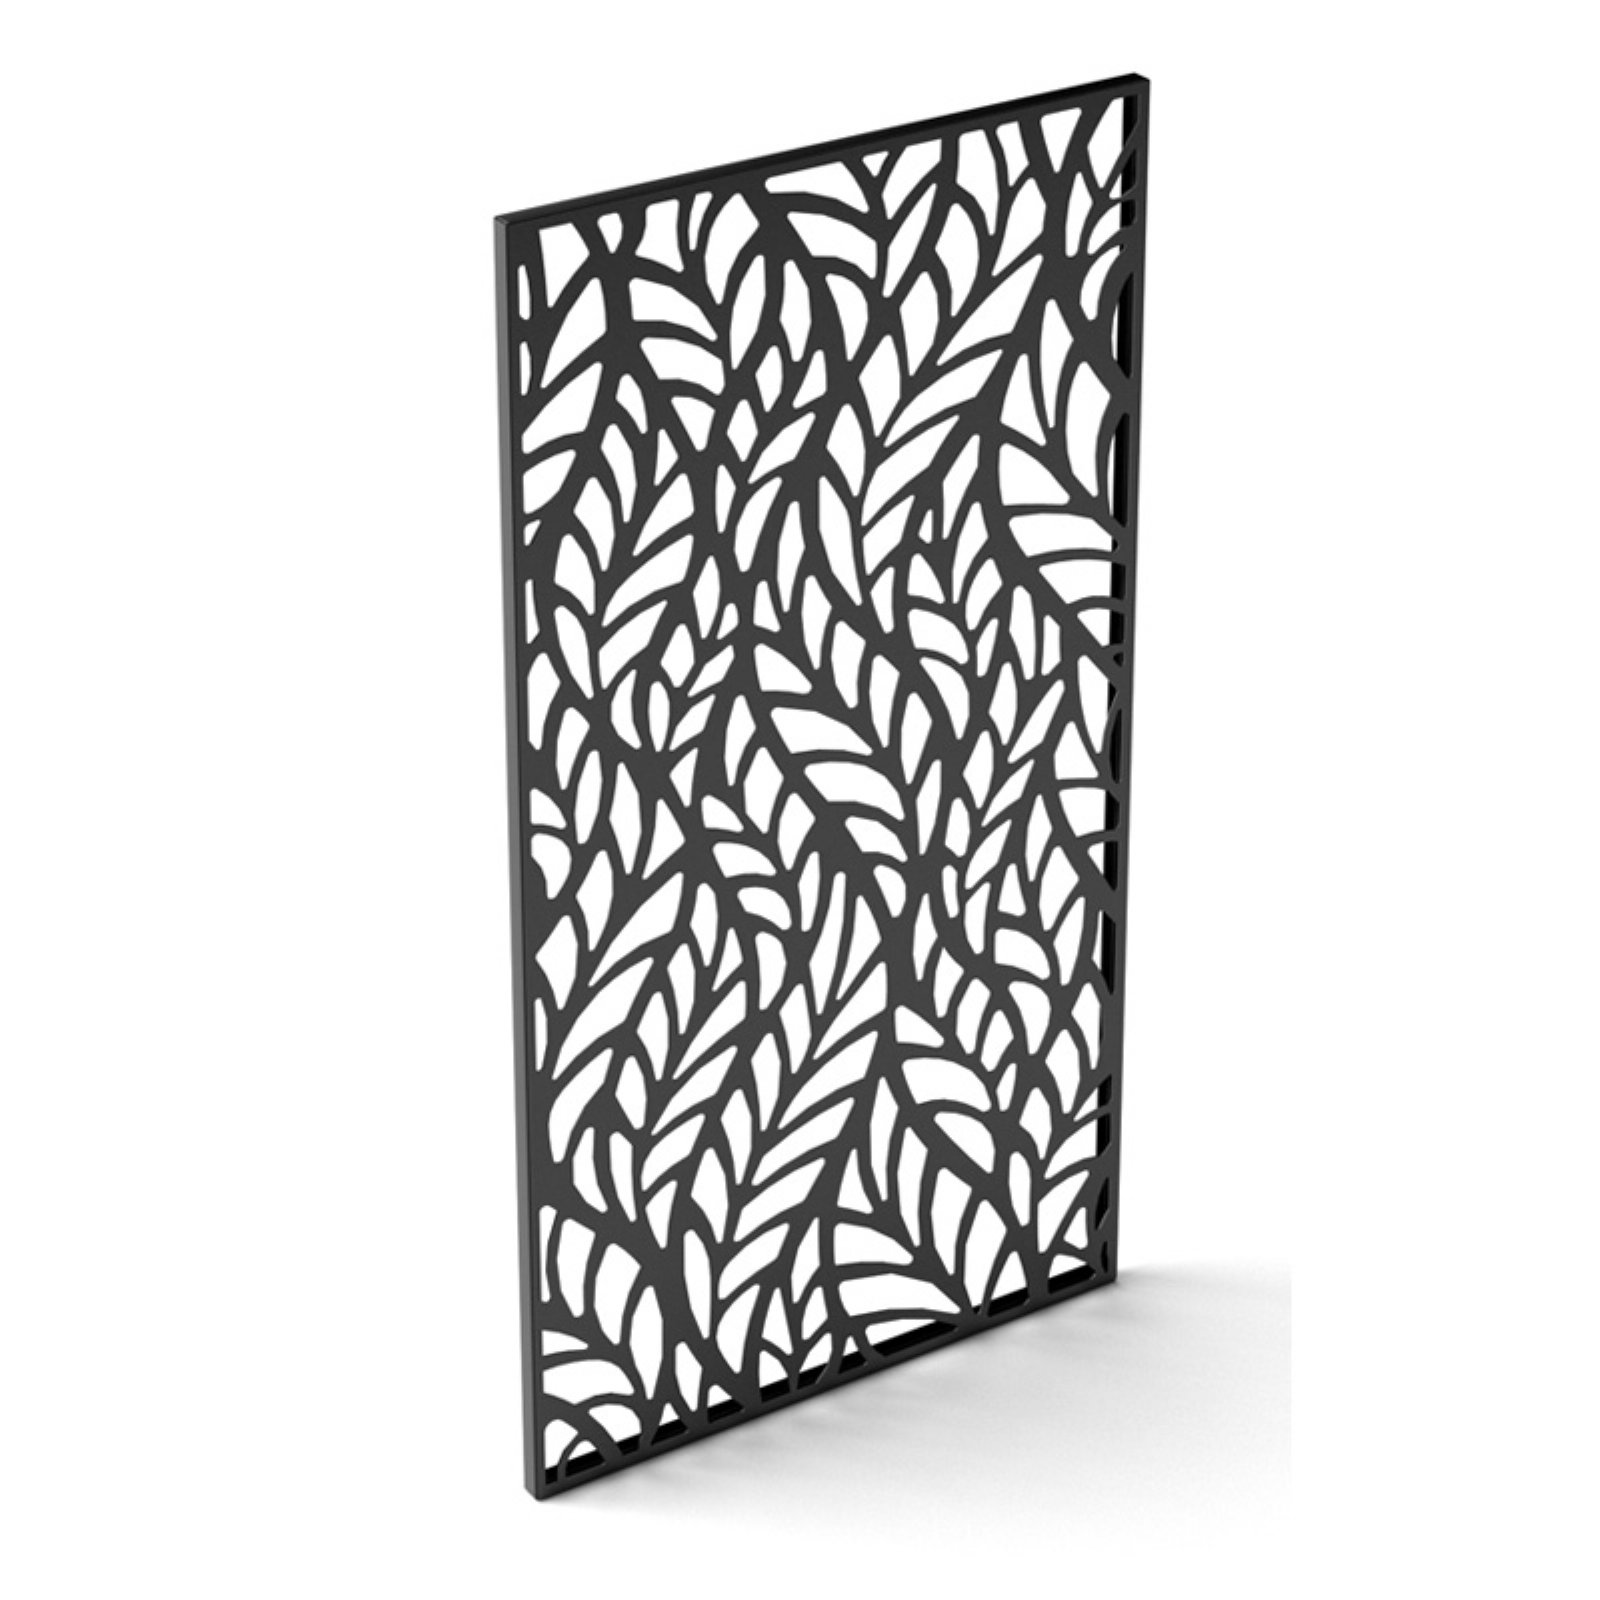 Veradek Flowleaf Outdoor Decorative Privacy Screen Panel